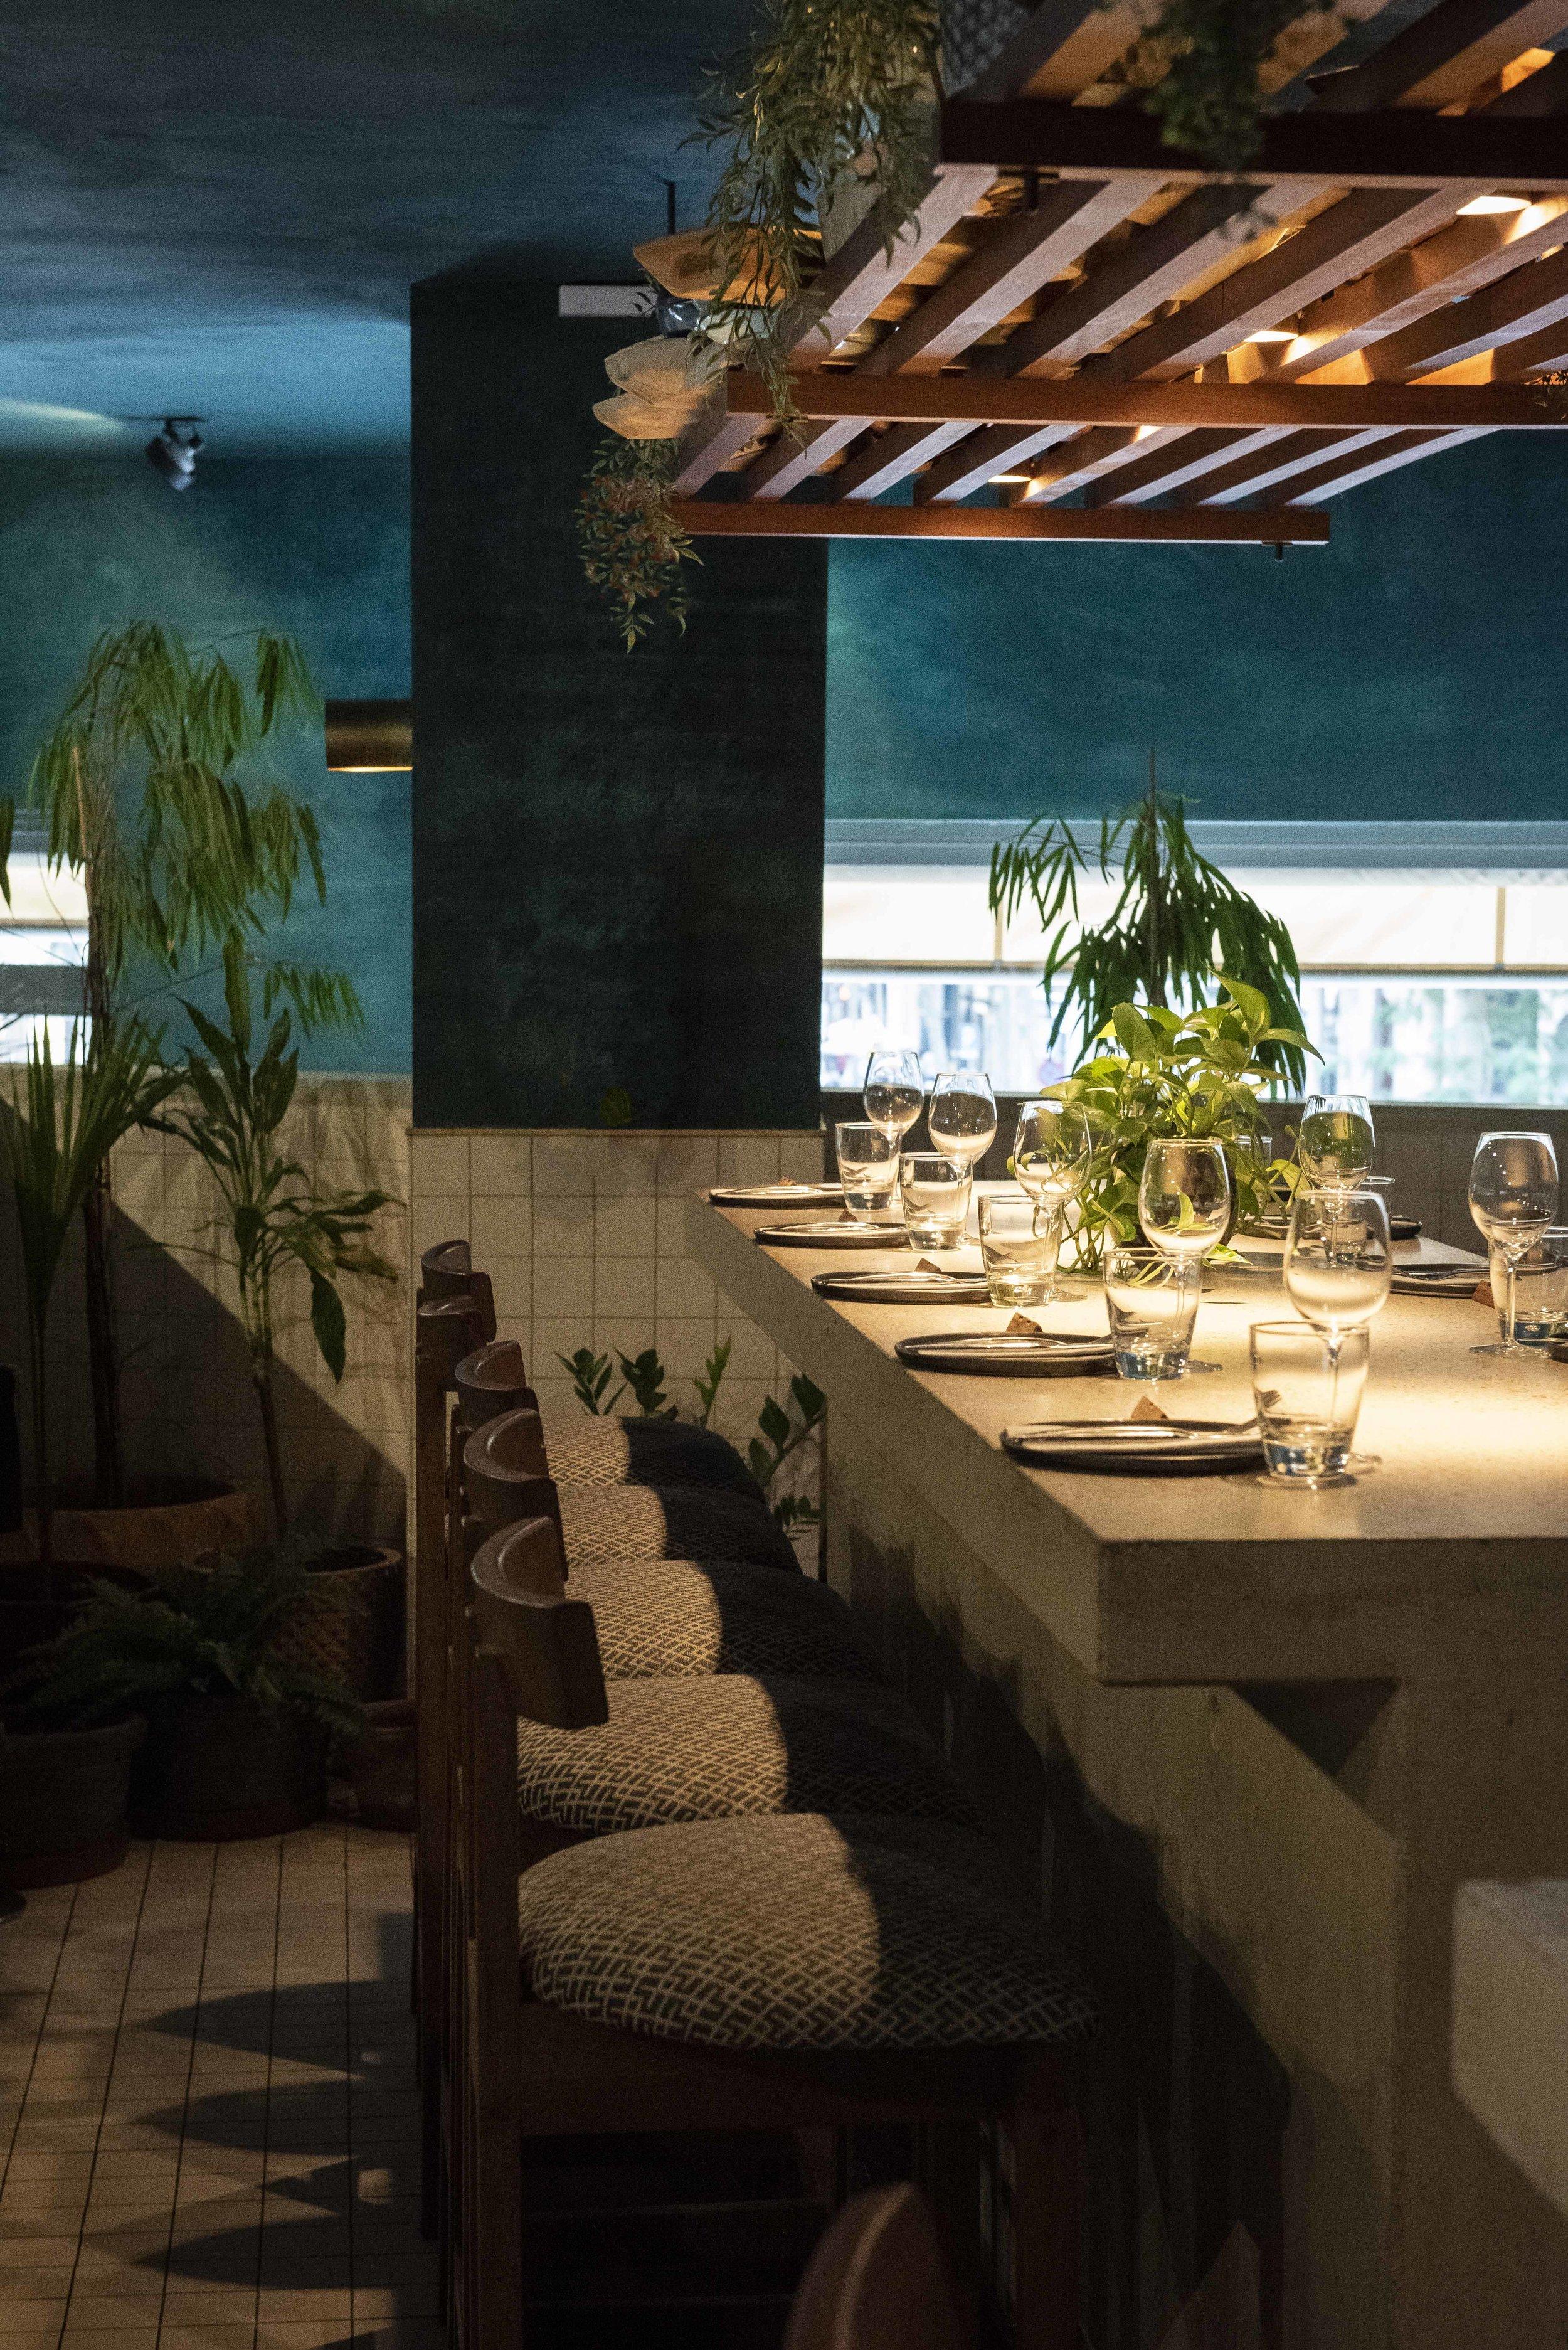 Khan upstairs at Chaka Khan restaurant, Barcelona. Photo © Barcelona Food Experience.